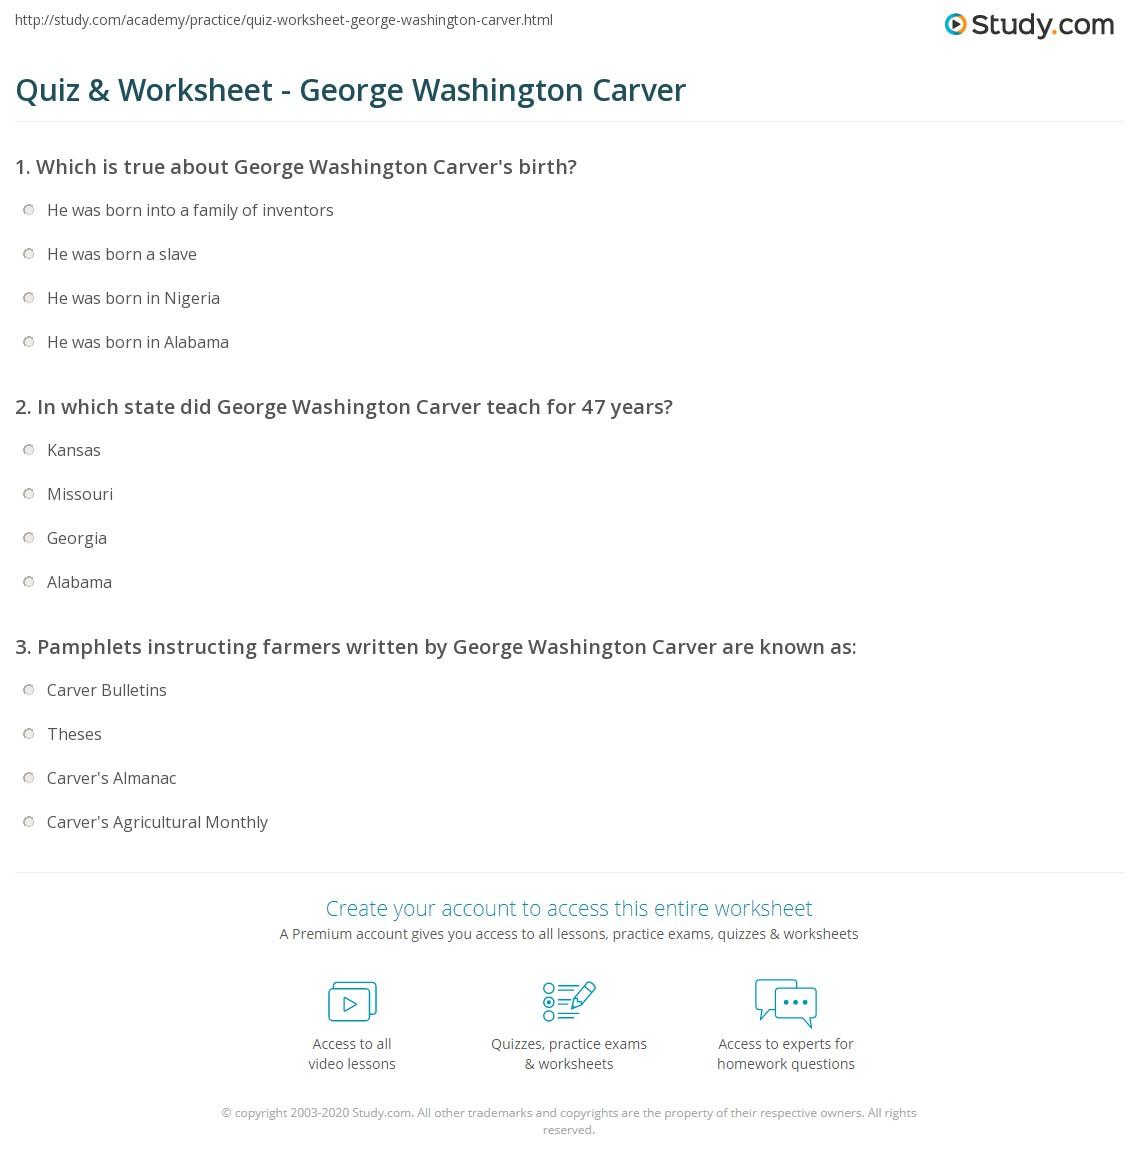 worksheet George Washington Carver Worksheets quiz worksheet george washington carver study com print inventions quotes biography worksheet